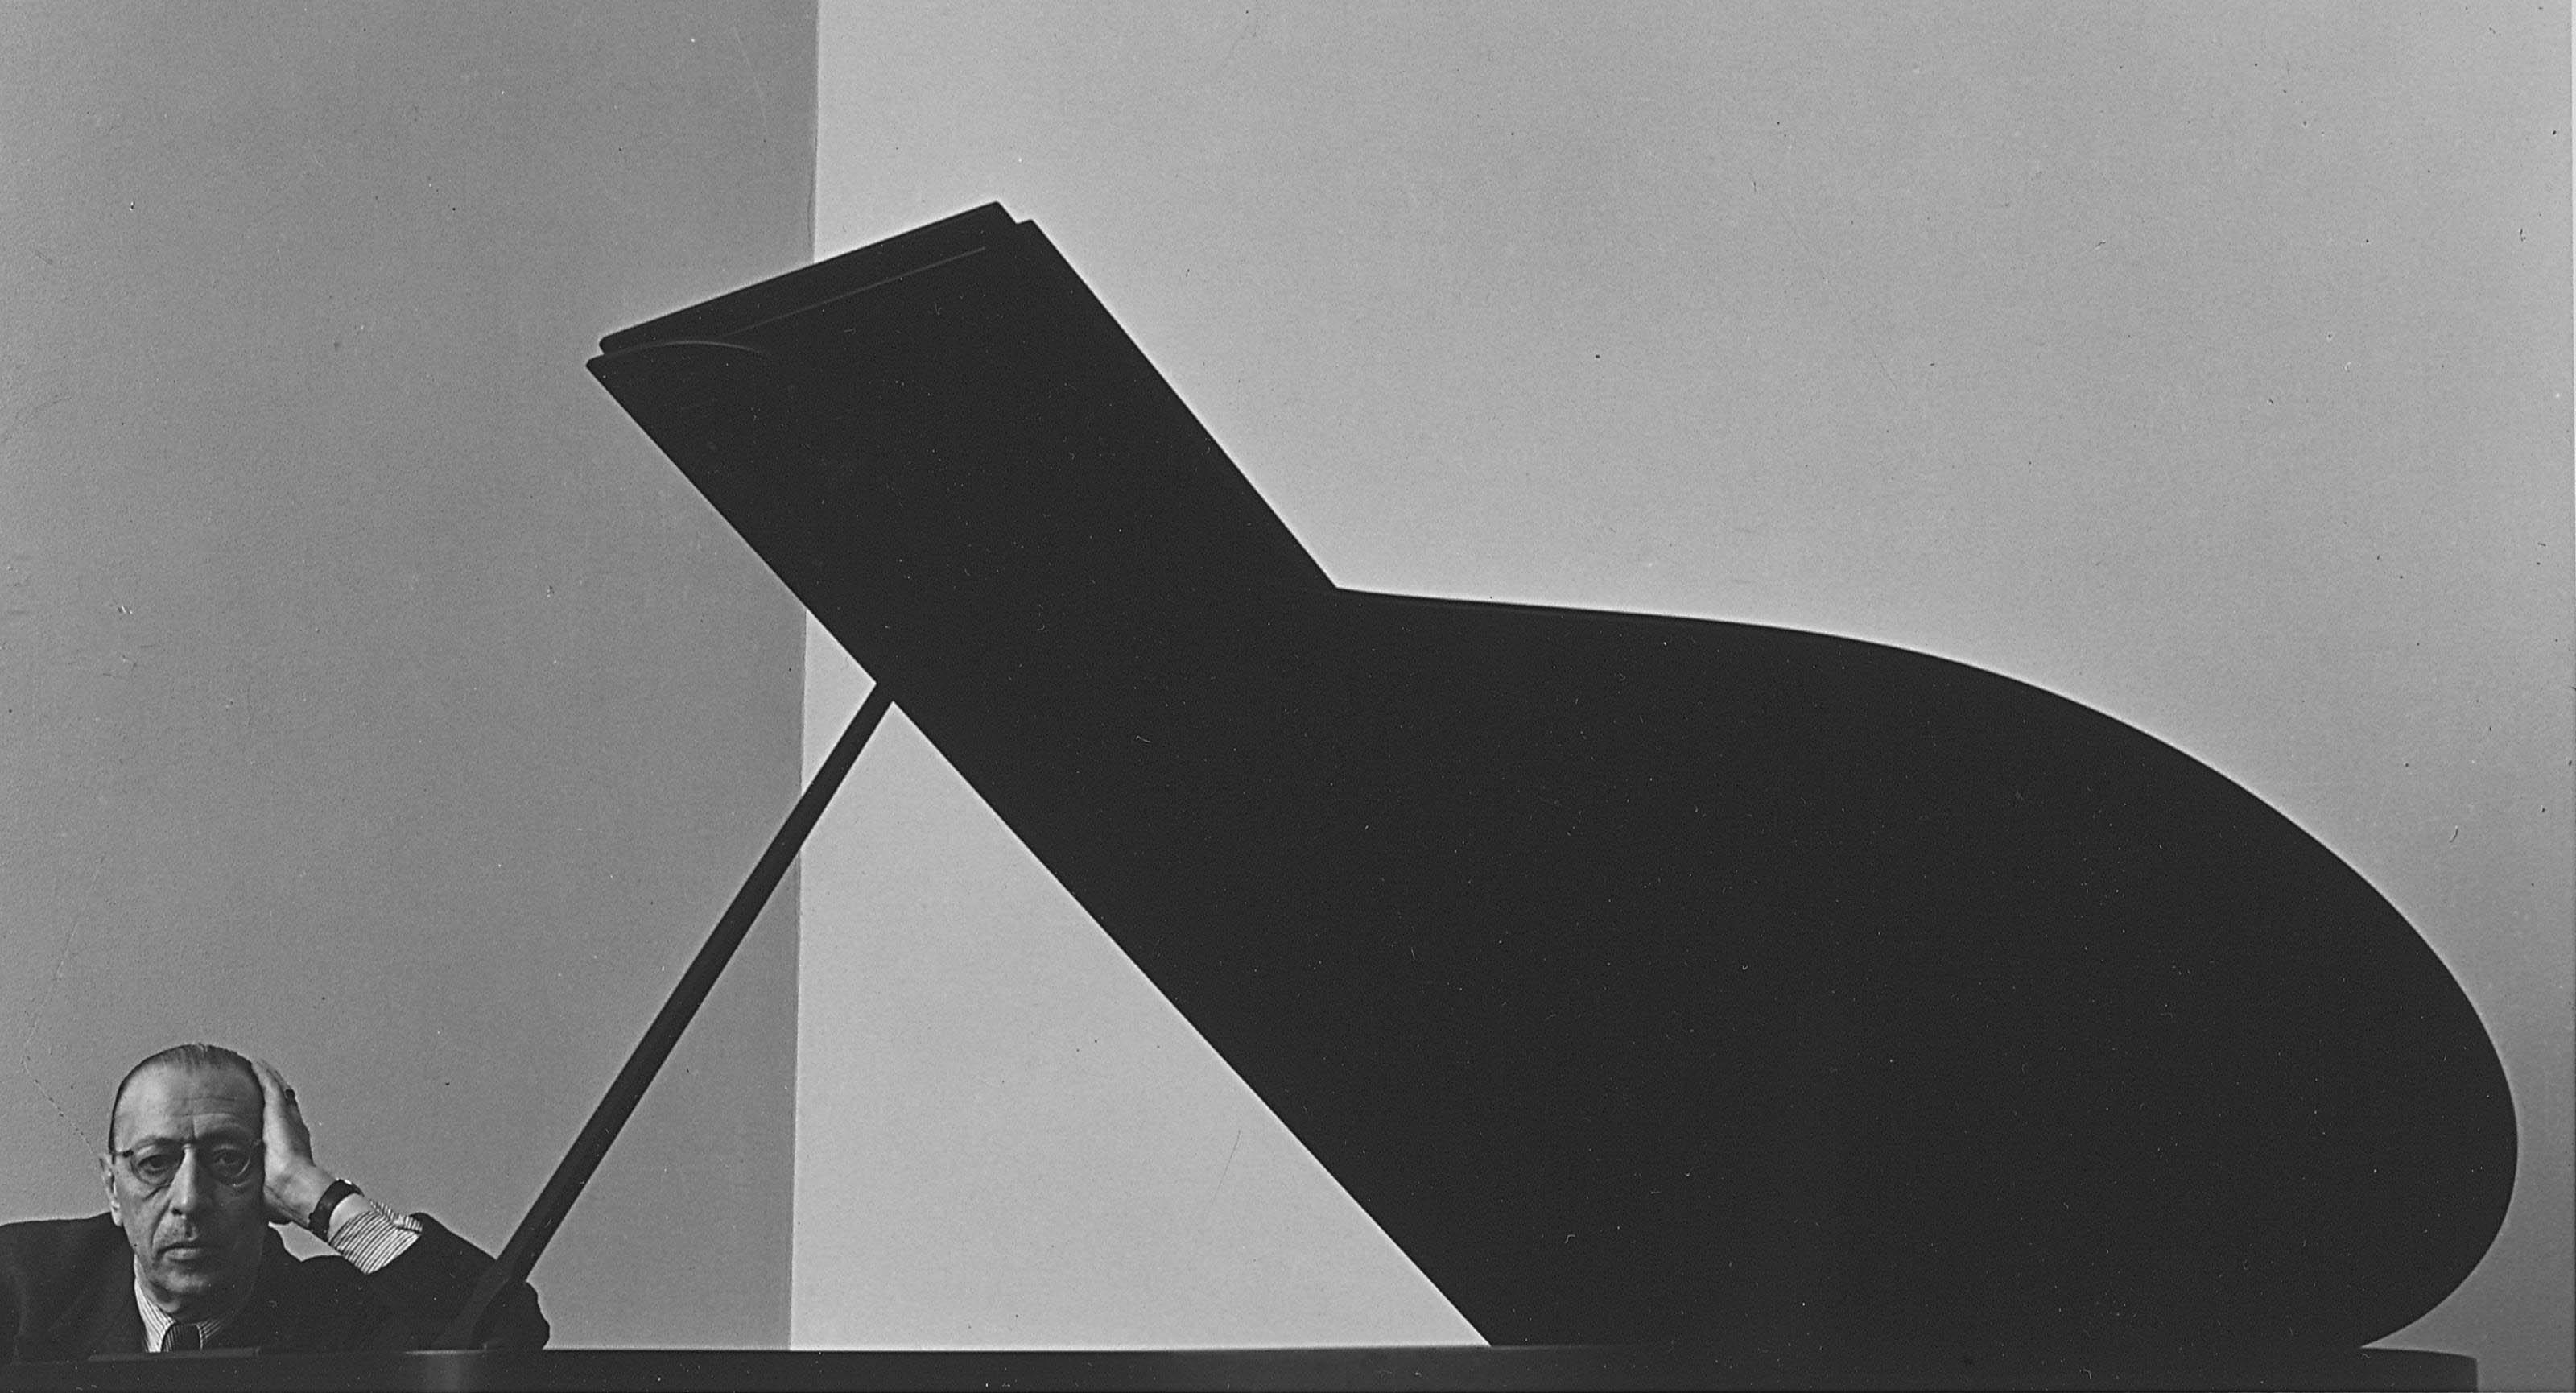 Igor Stravinsky, New York City, 1946